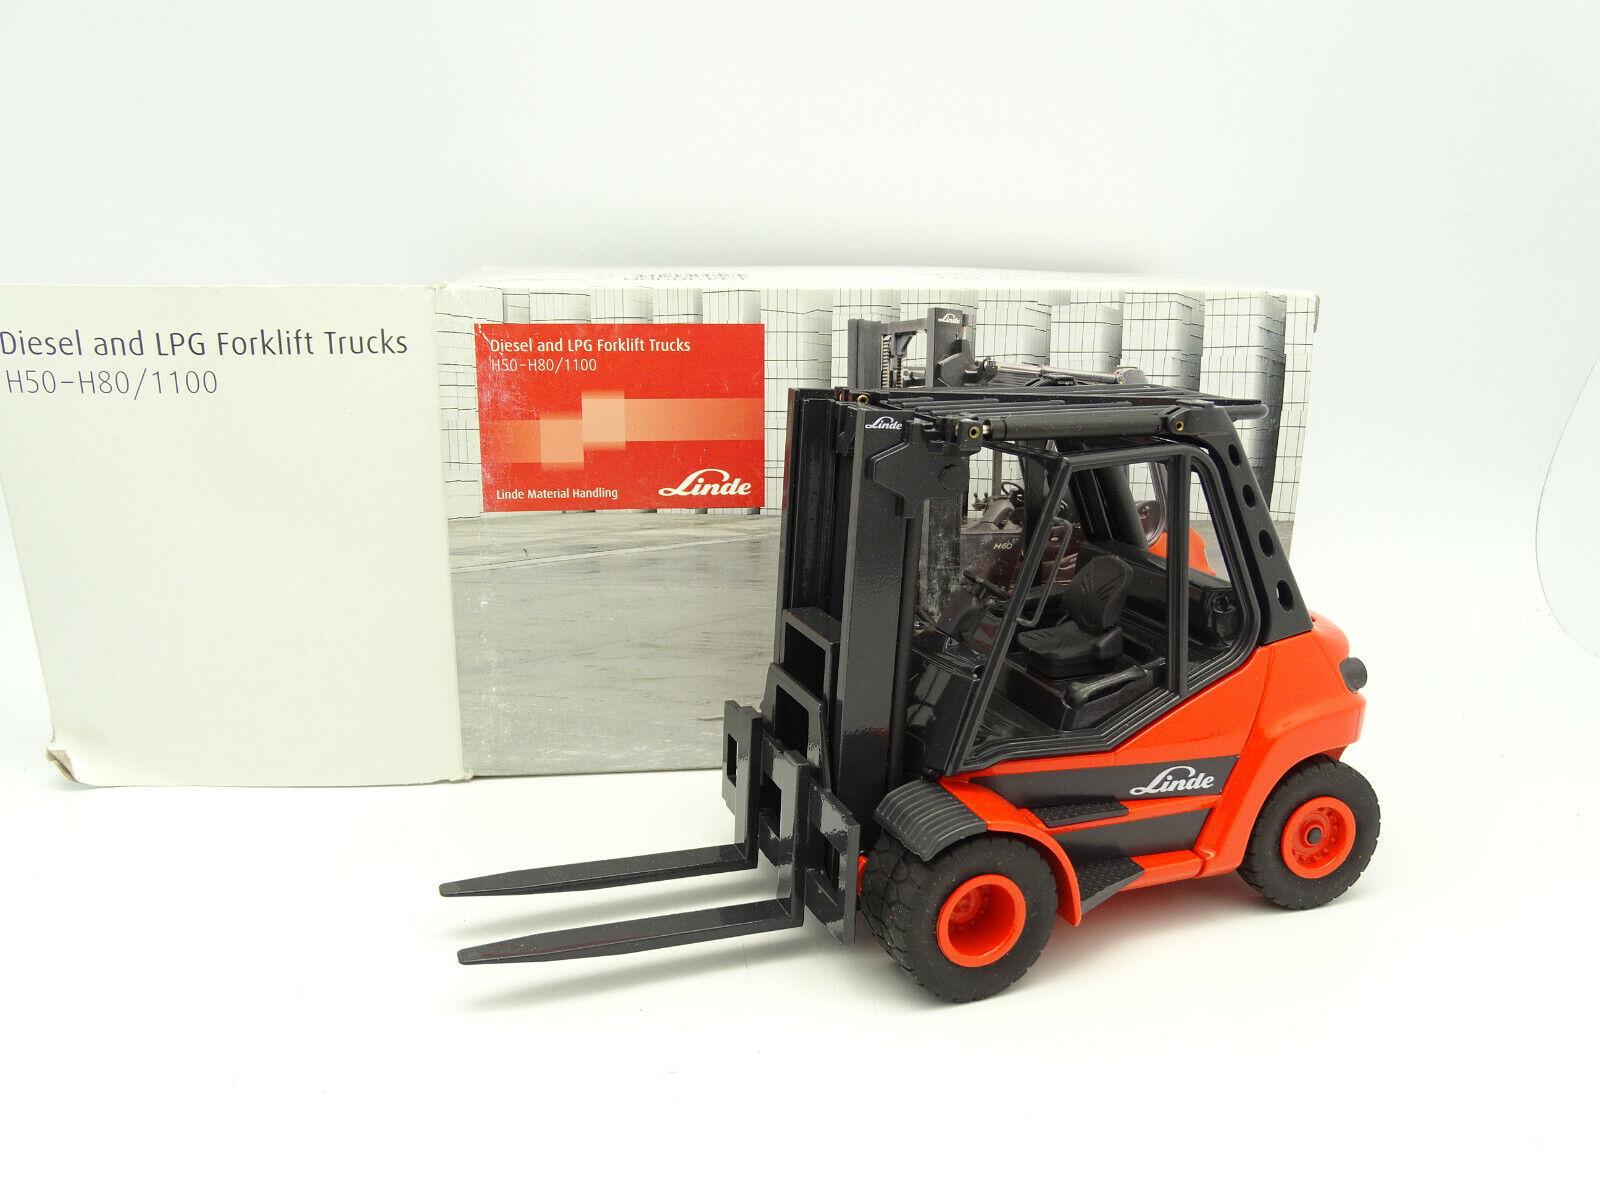 servizio onesto Conrad 1 25 25 25 TP BTP - Forklift Chariot élévateur Linde H50 H80  1100  consegna gratuita